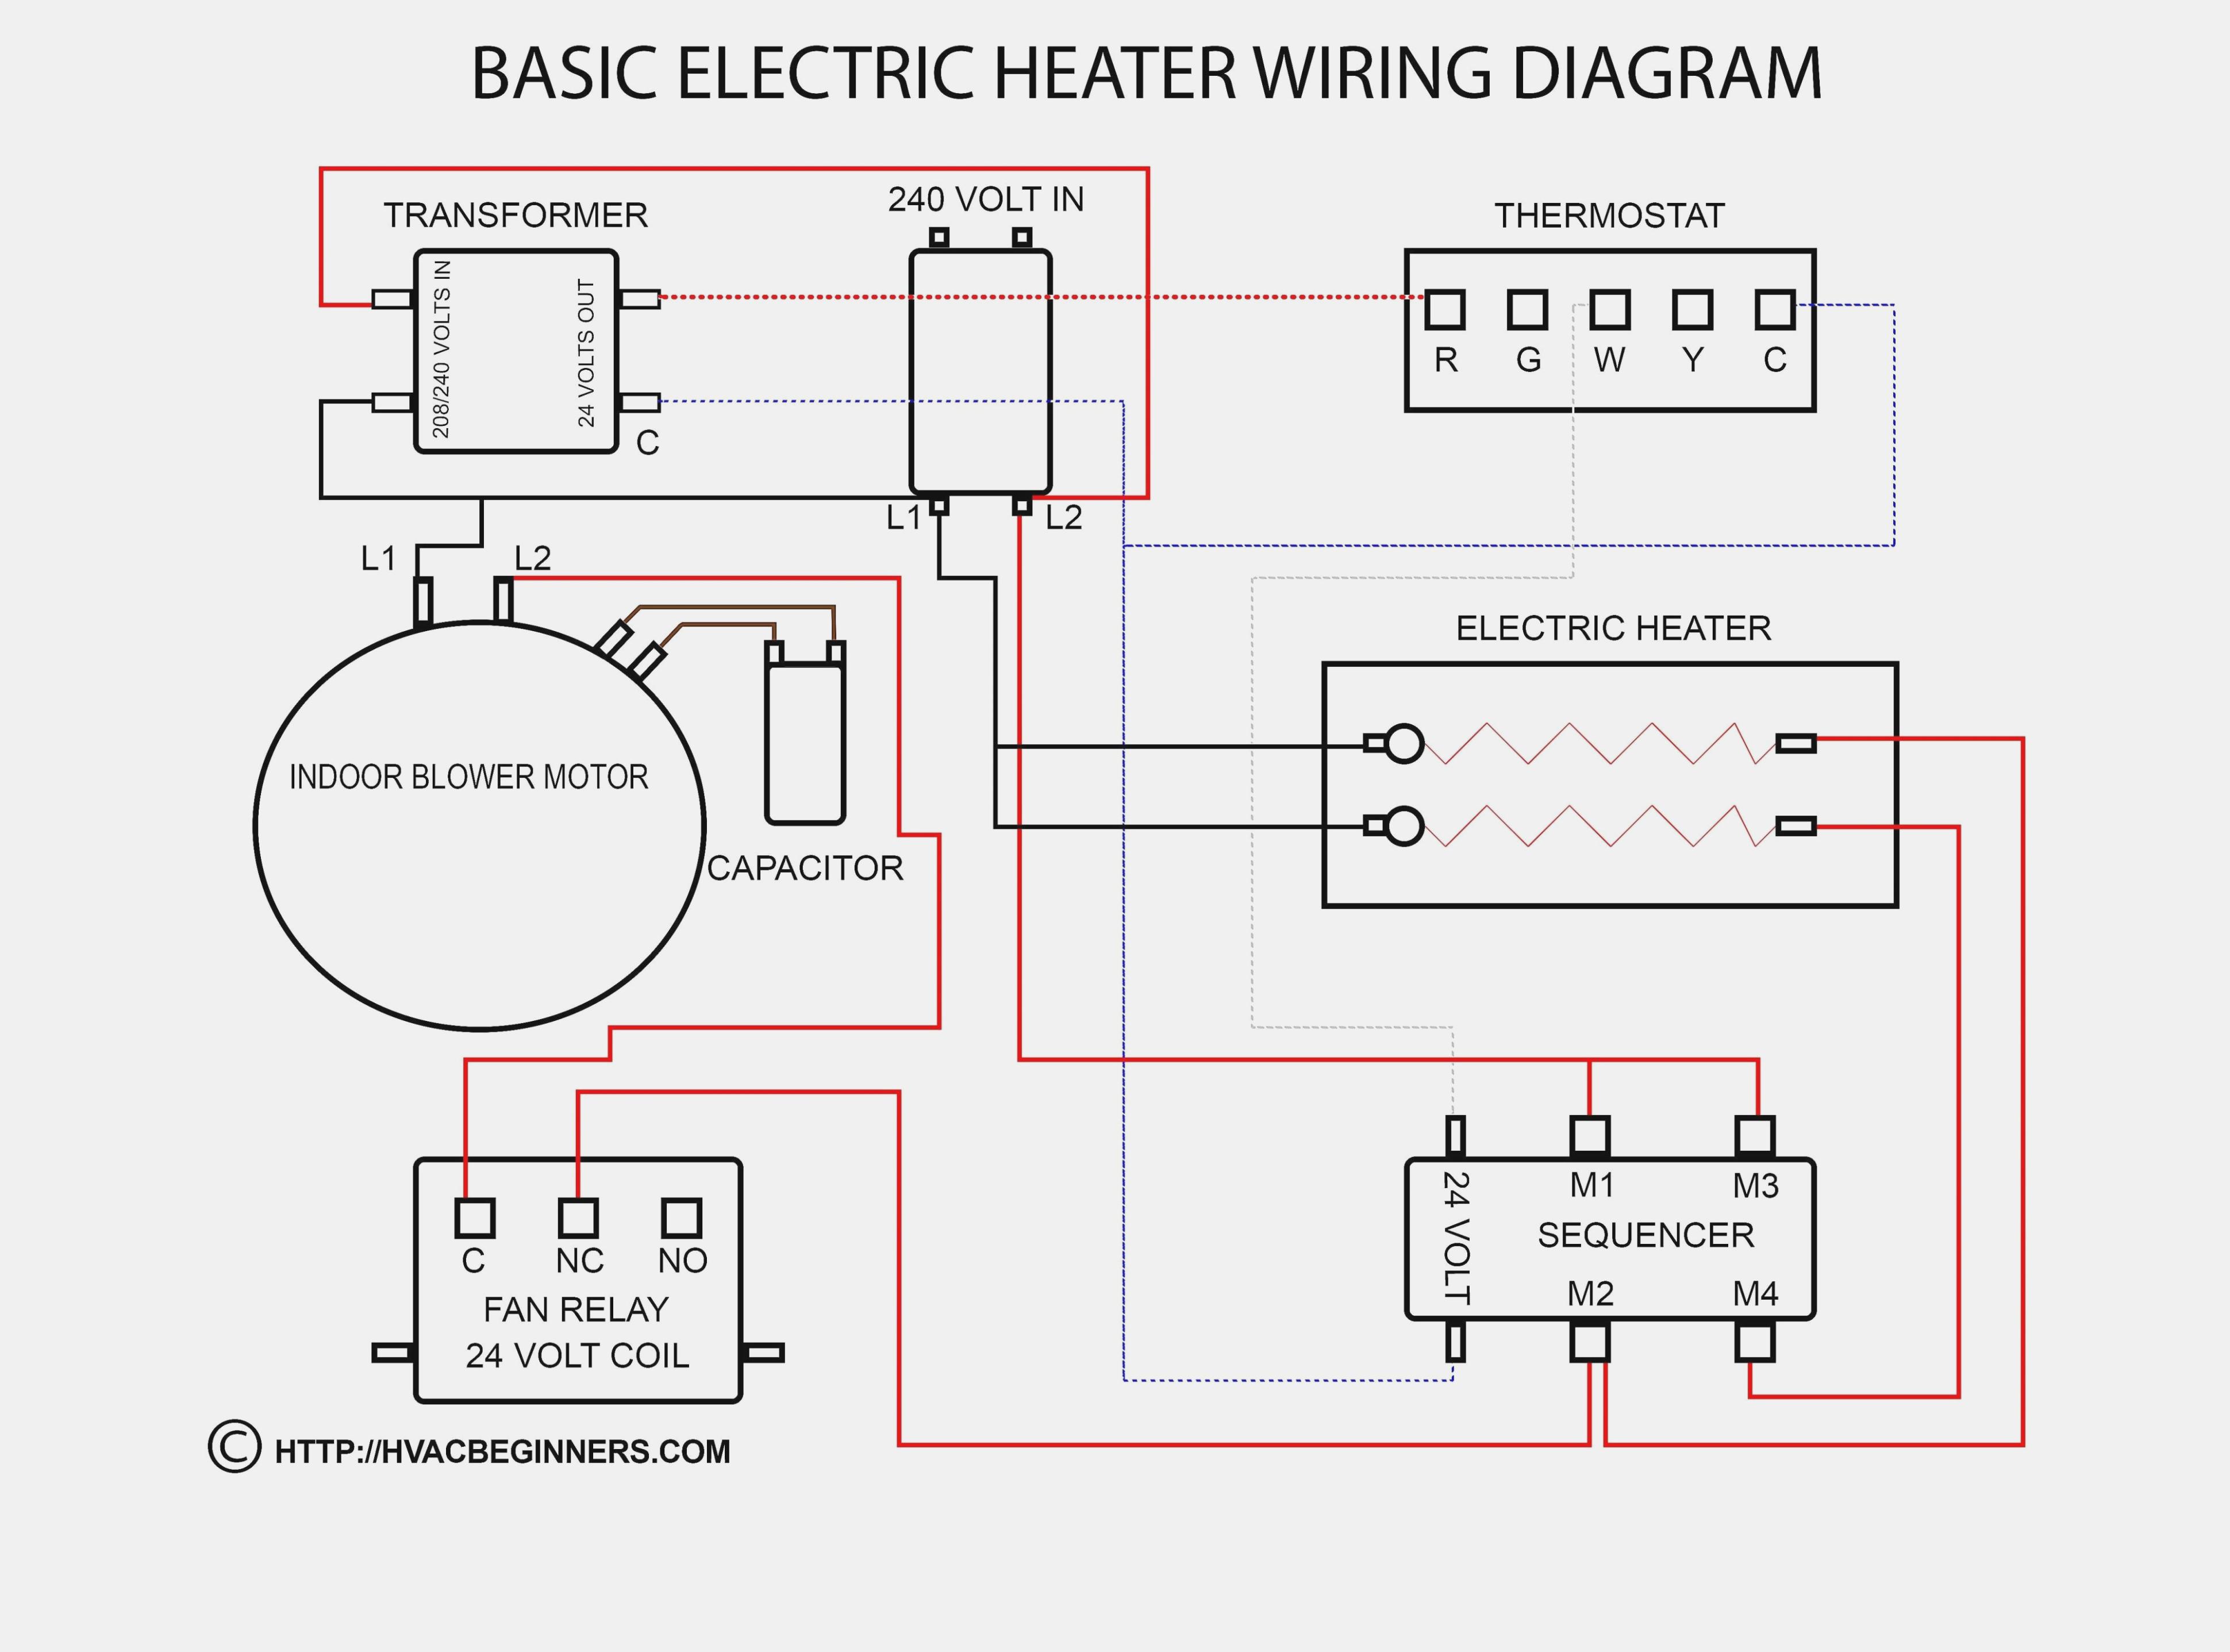 Electrical Wiring Diagrams Wrg 2562 Electrical Hvac Wiring